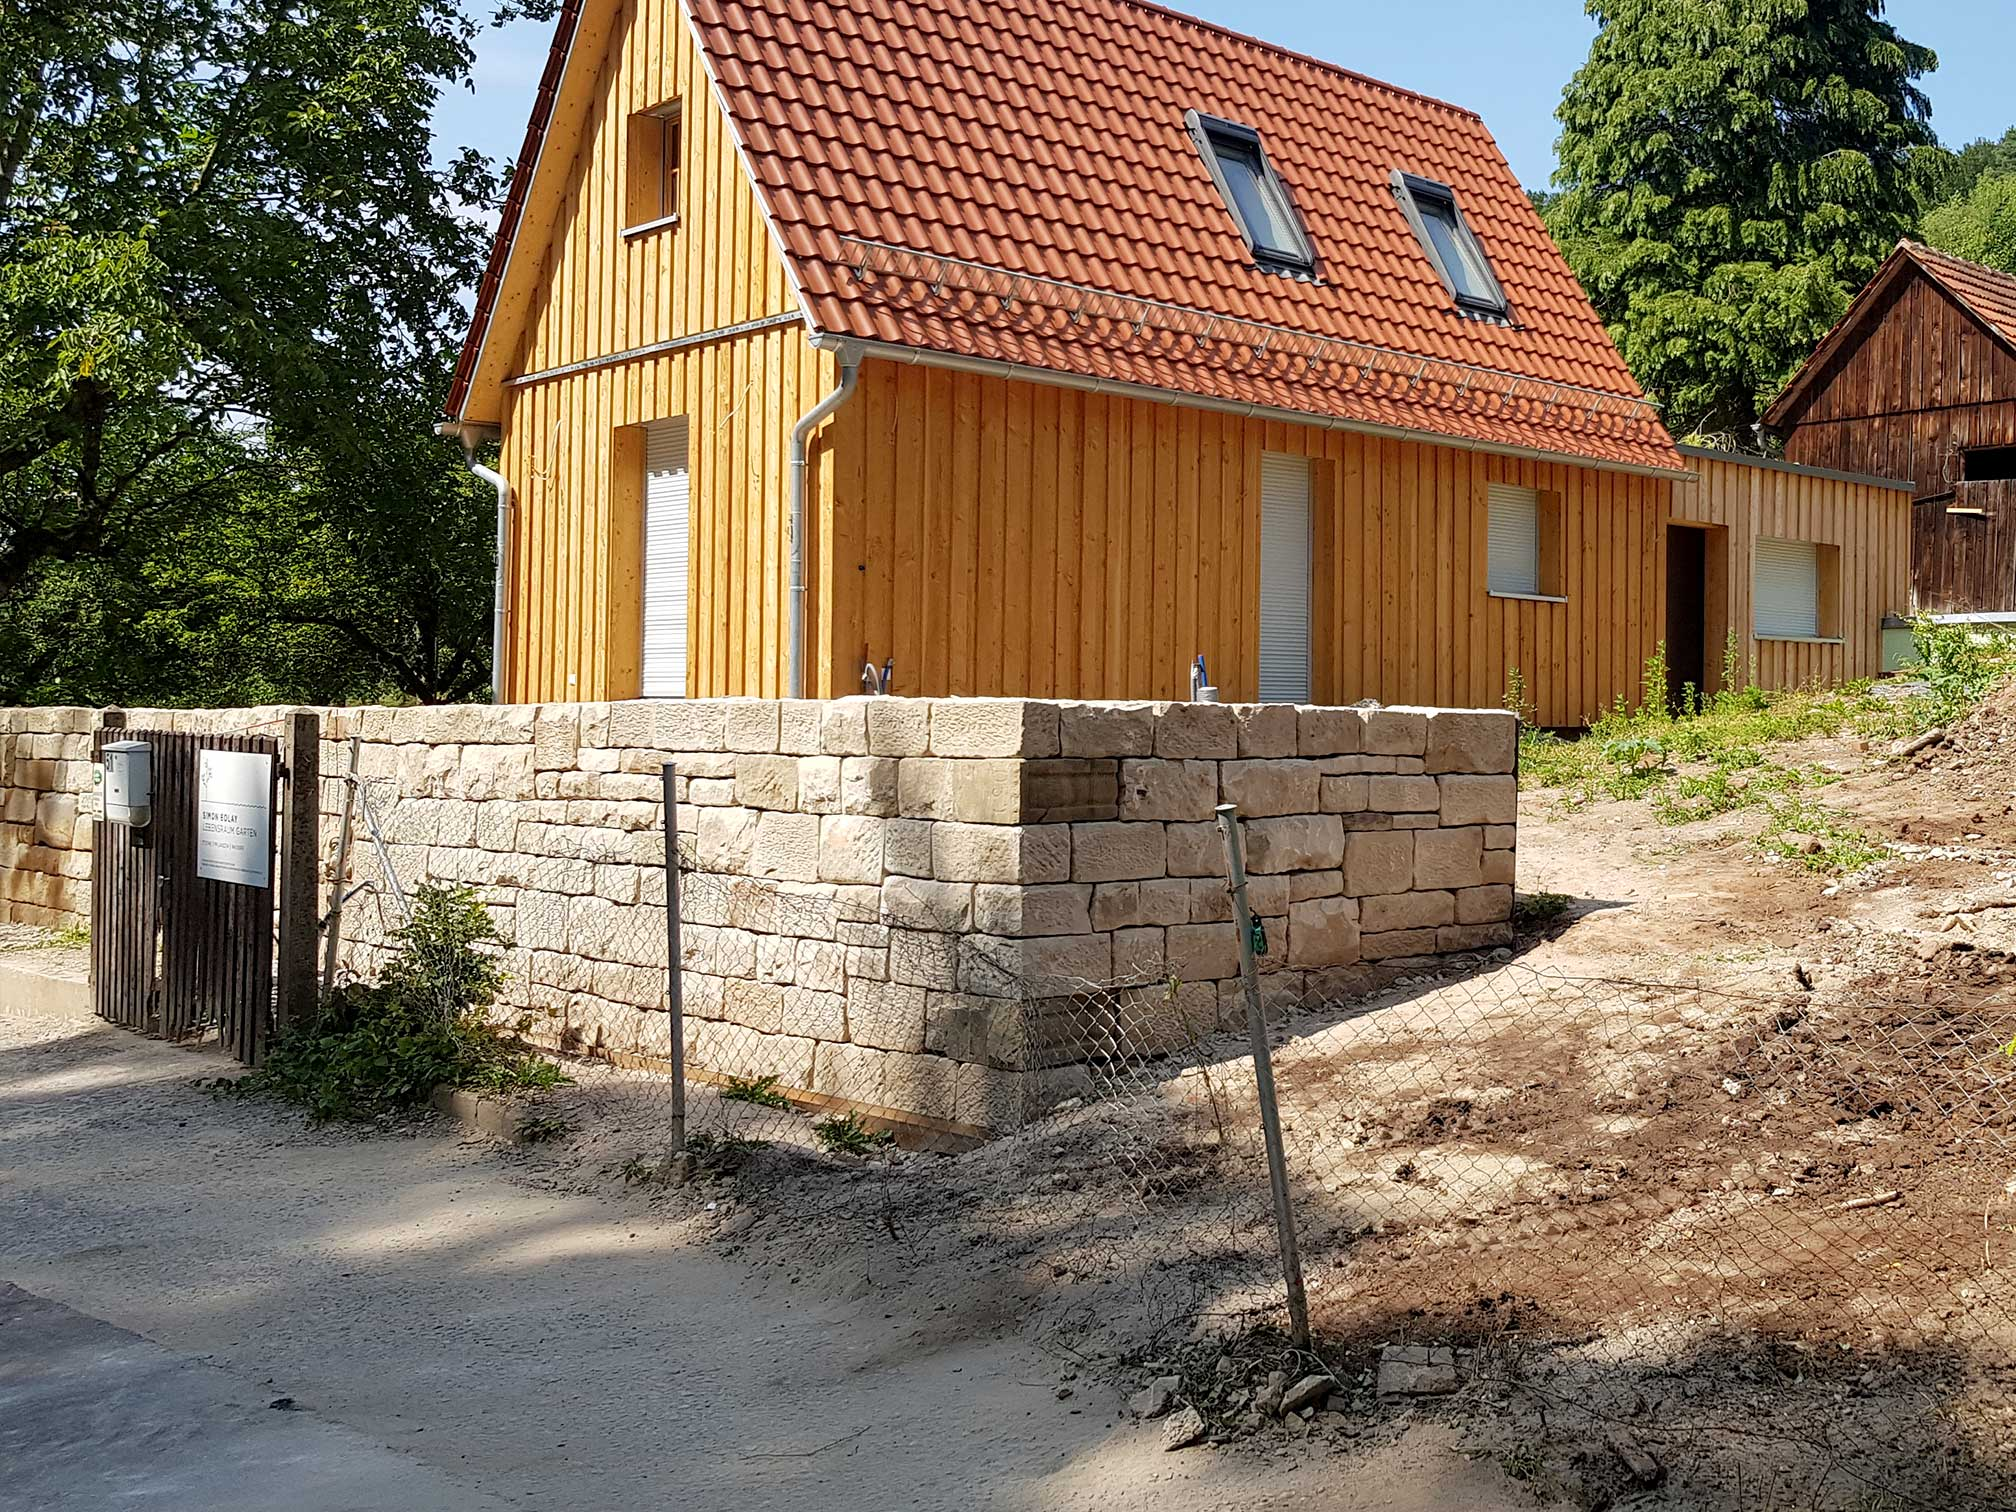 bolay-gartenbau_projekte_simi-haeusle_04_mauerbau